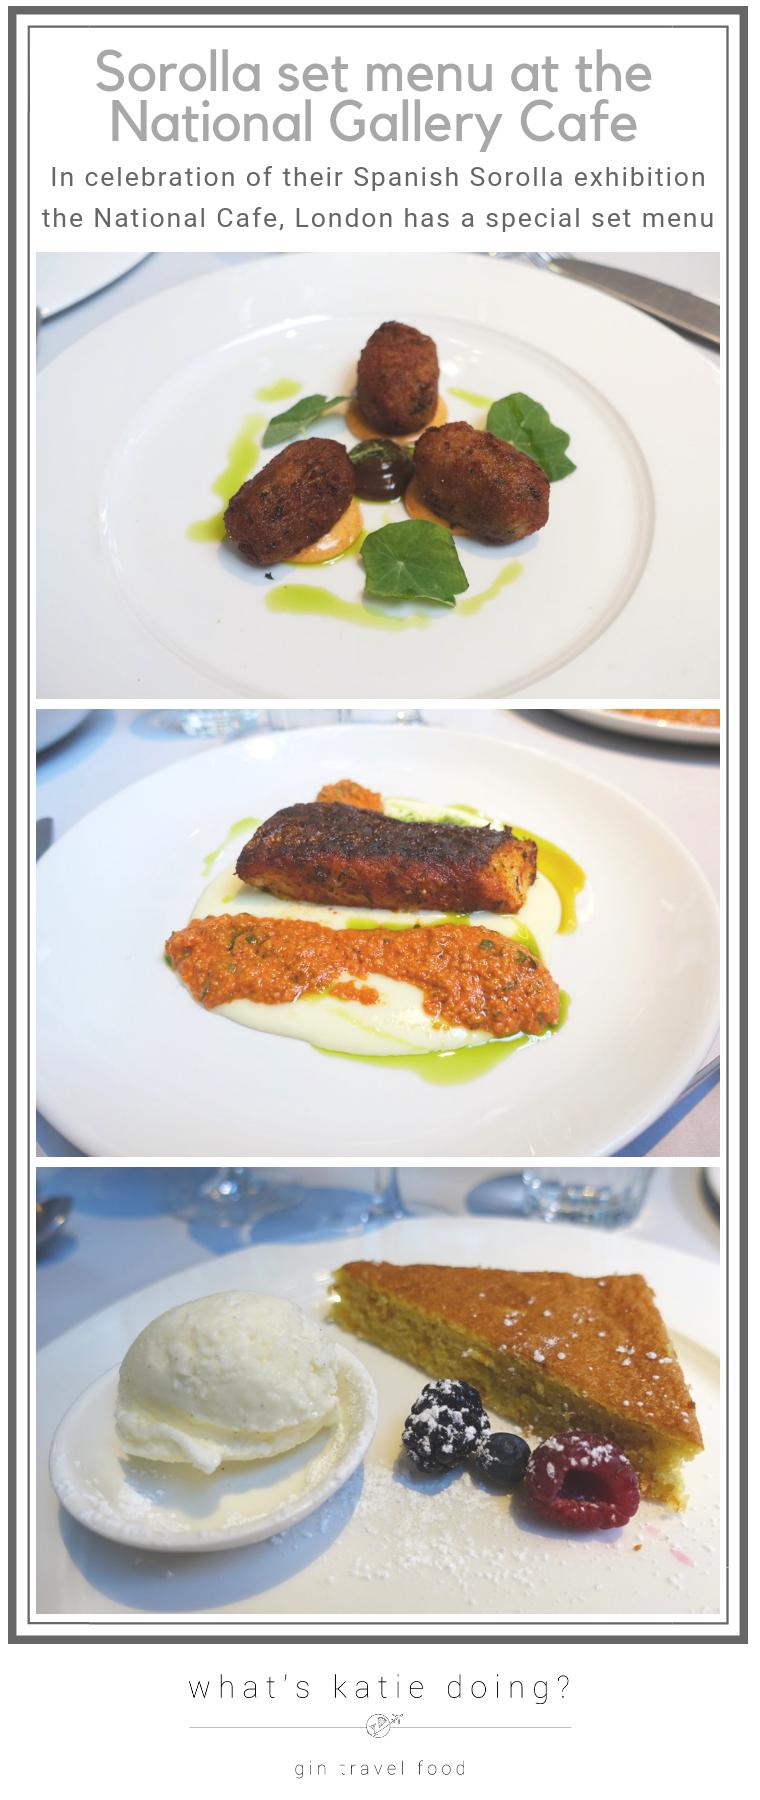 Sorolla set menu at the National Gallery Cafe London